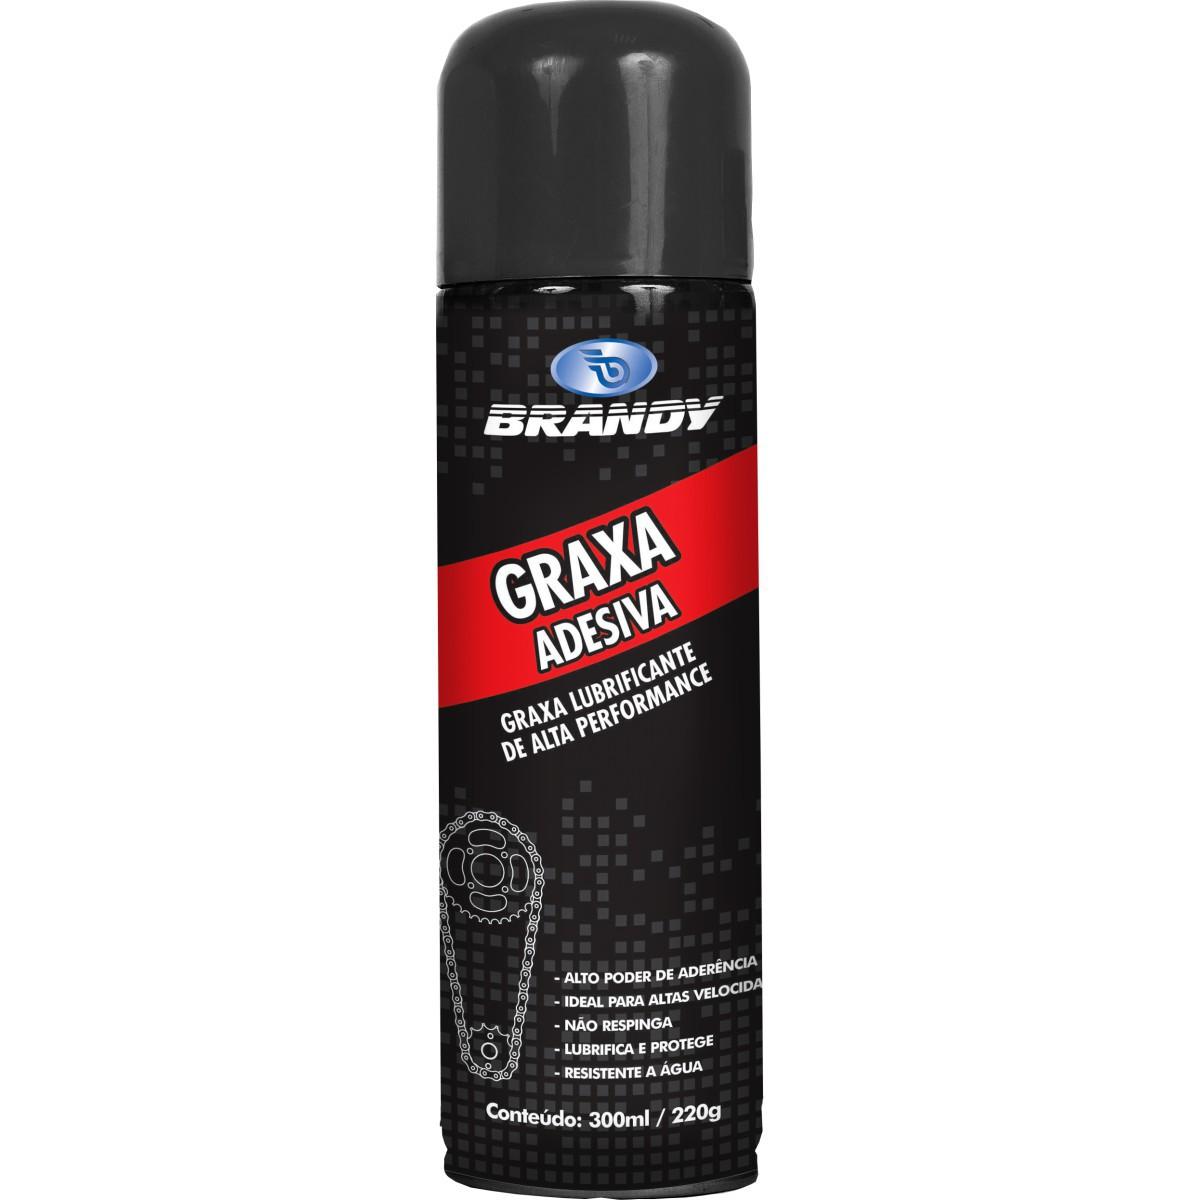 KIT C/ 4 GRAXA BRANDY ADESIVA SPRAY LATA 300ml/220g